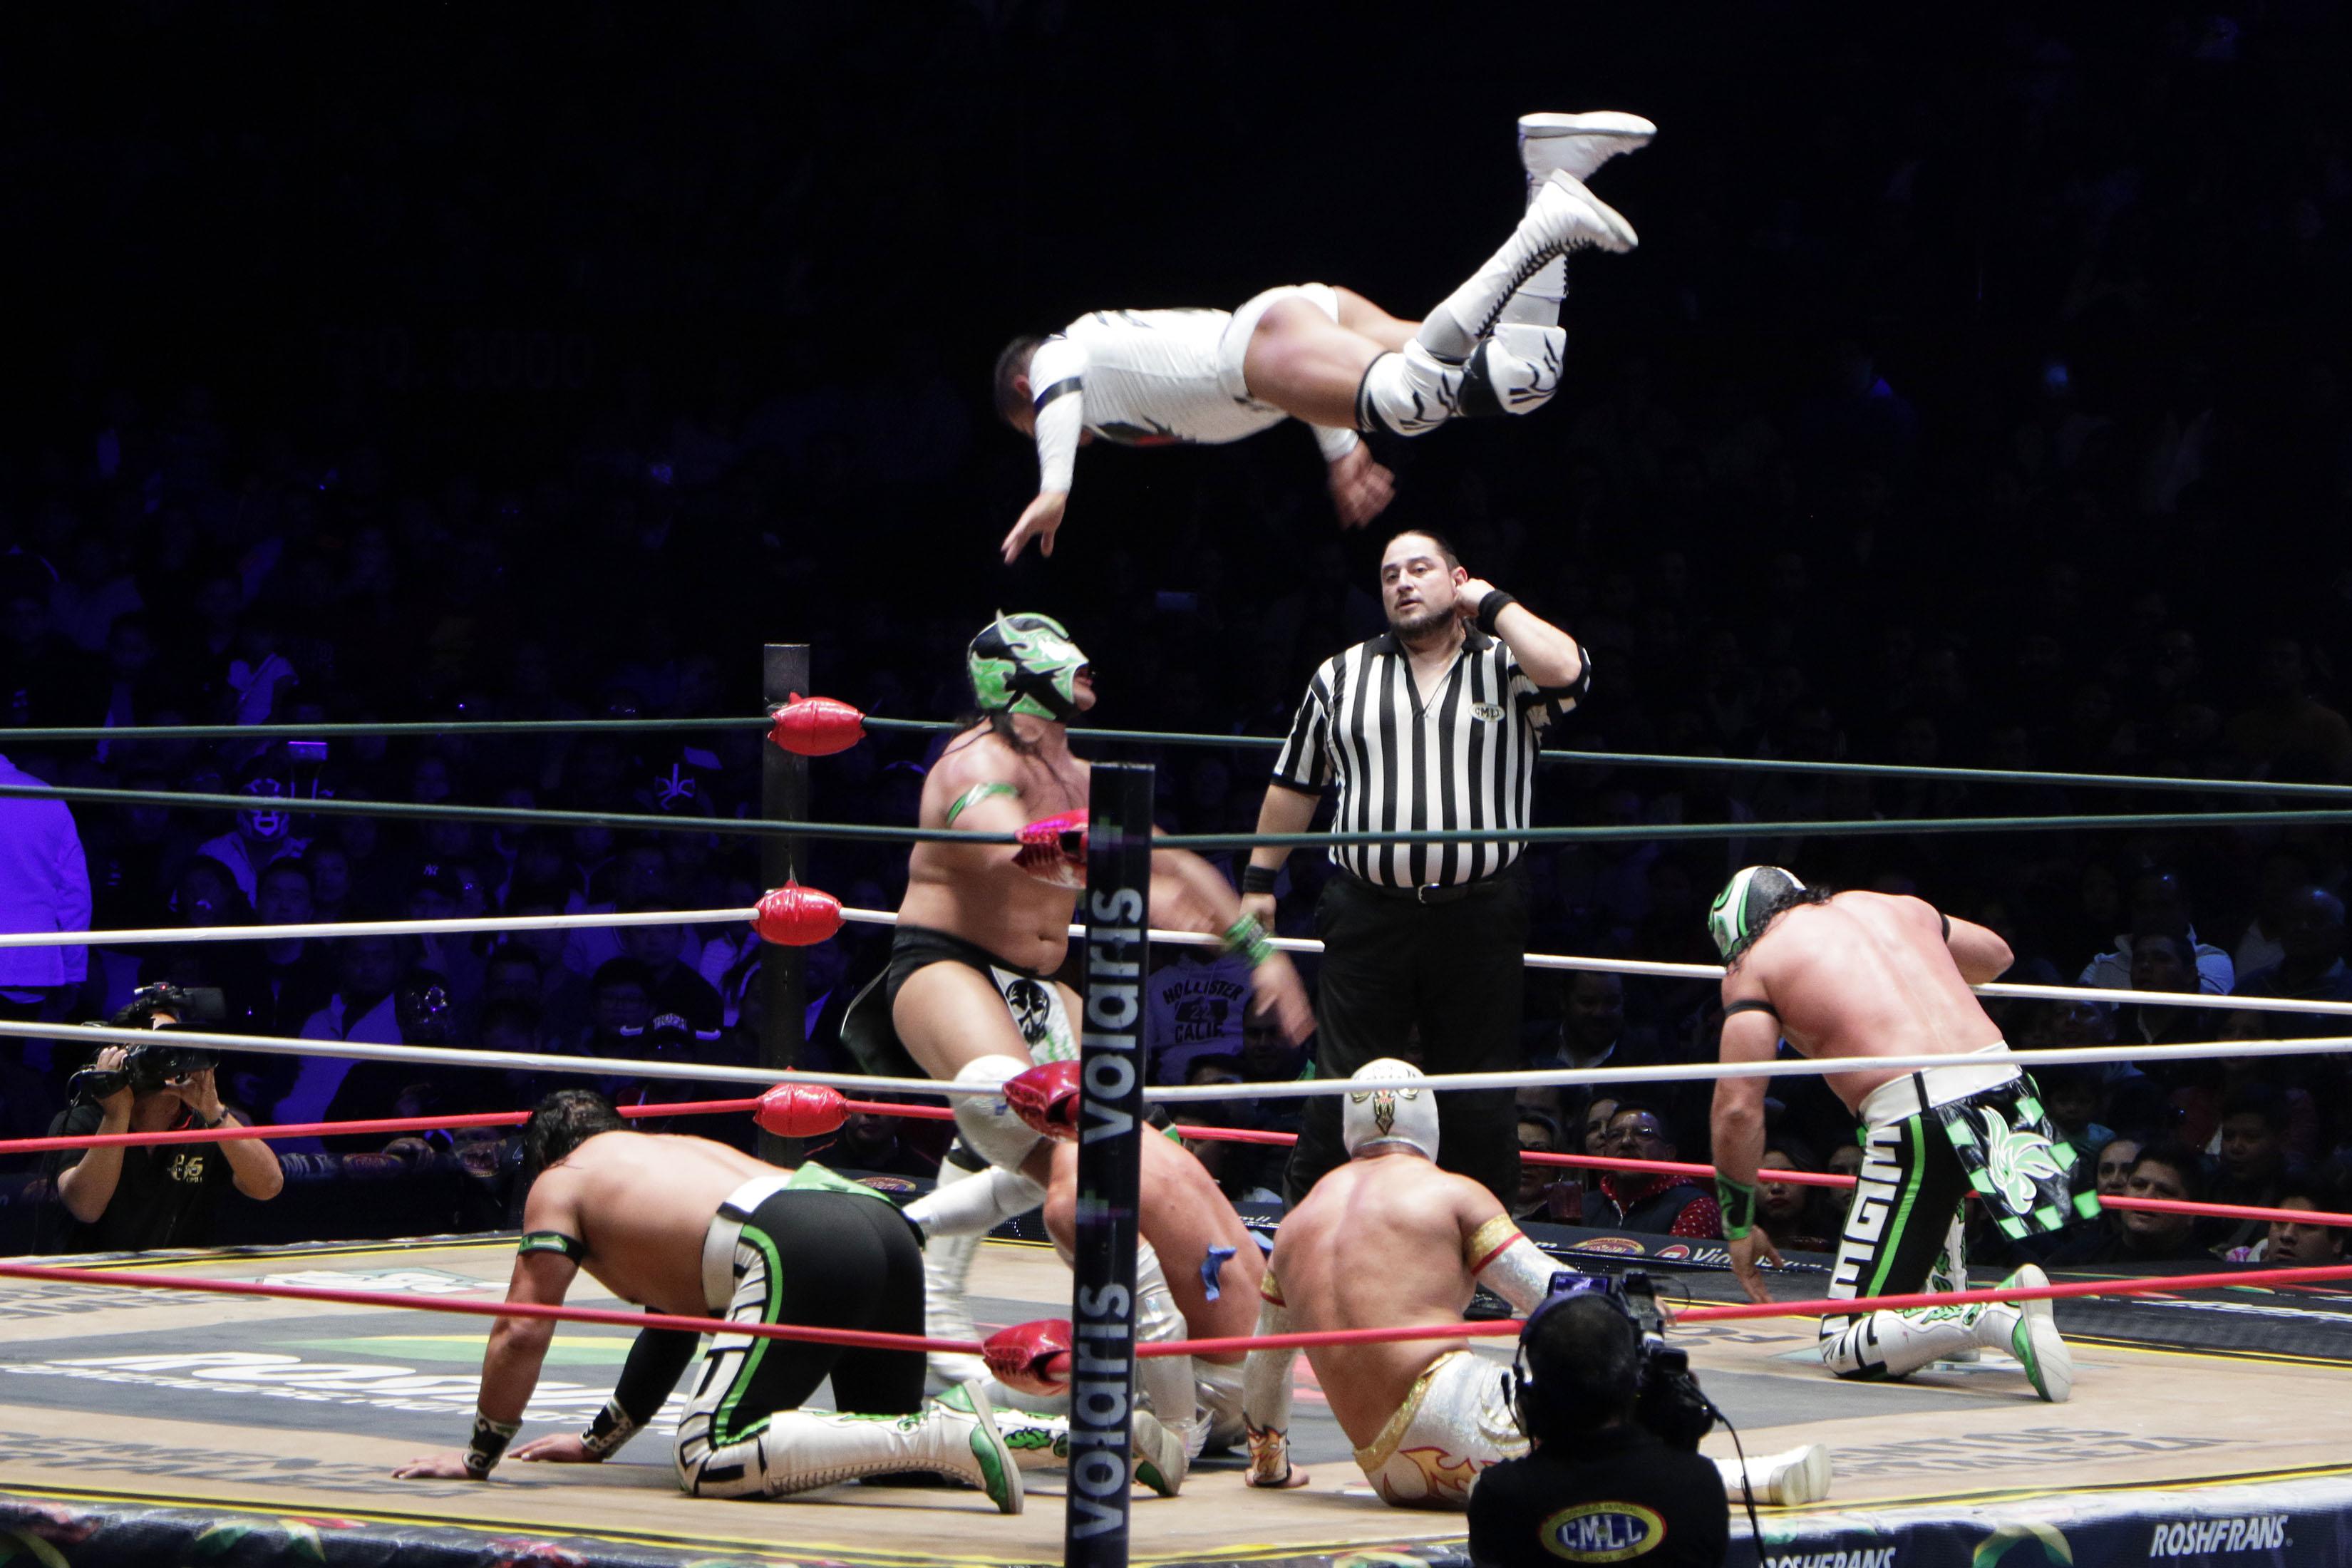 A fun Mexico City tour involves Lucha Libra wrestling matches